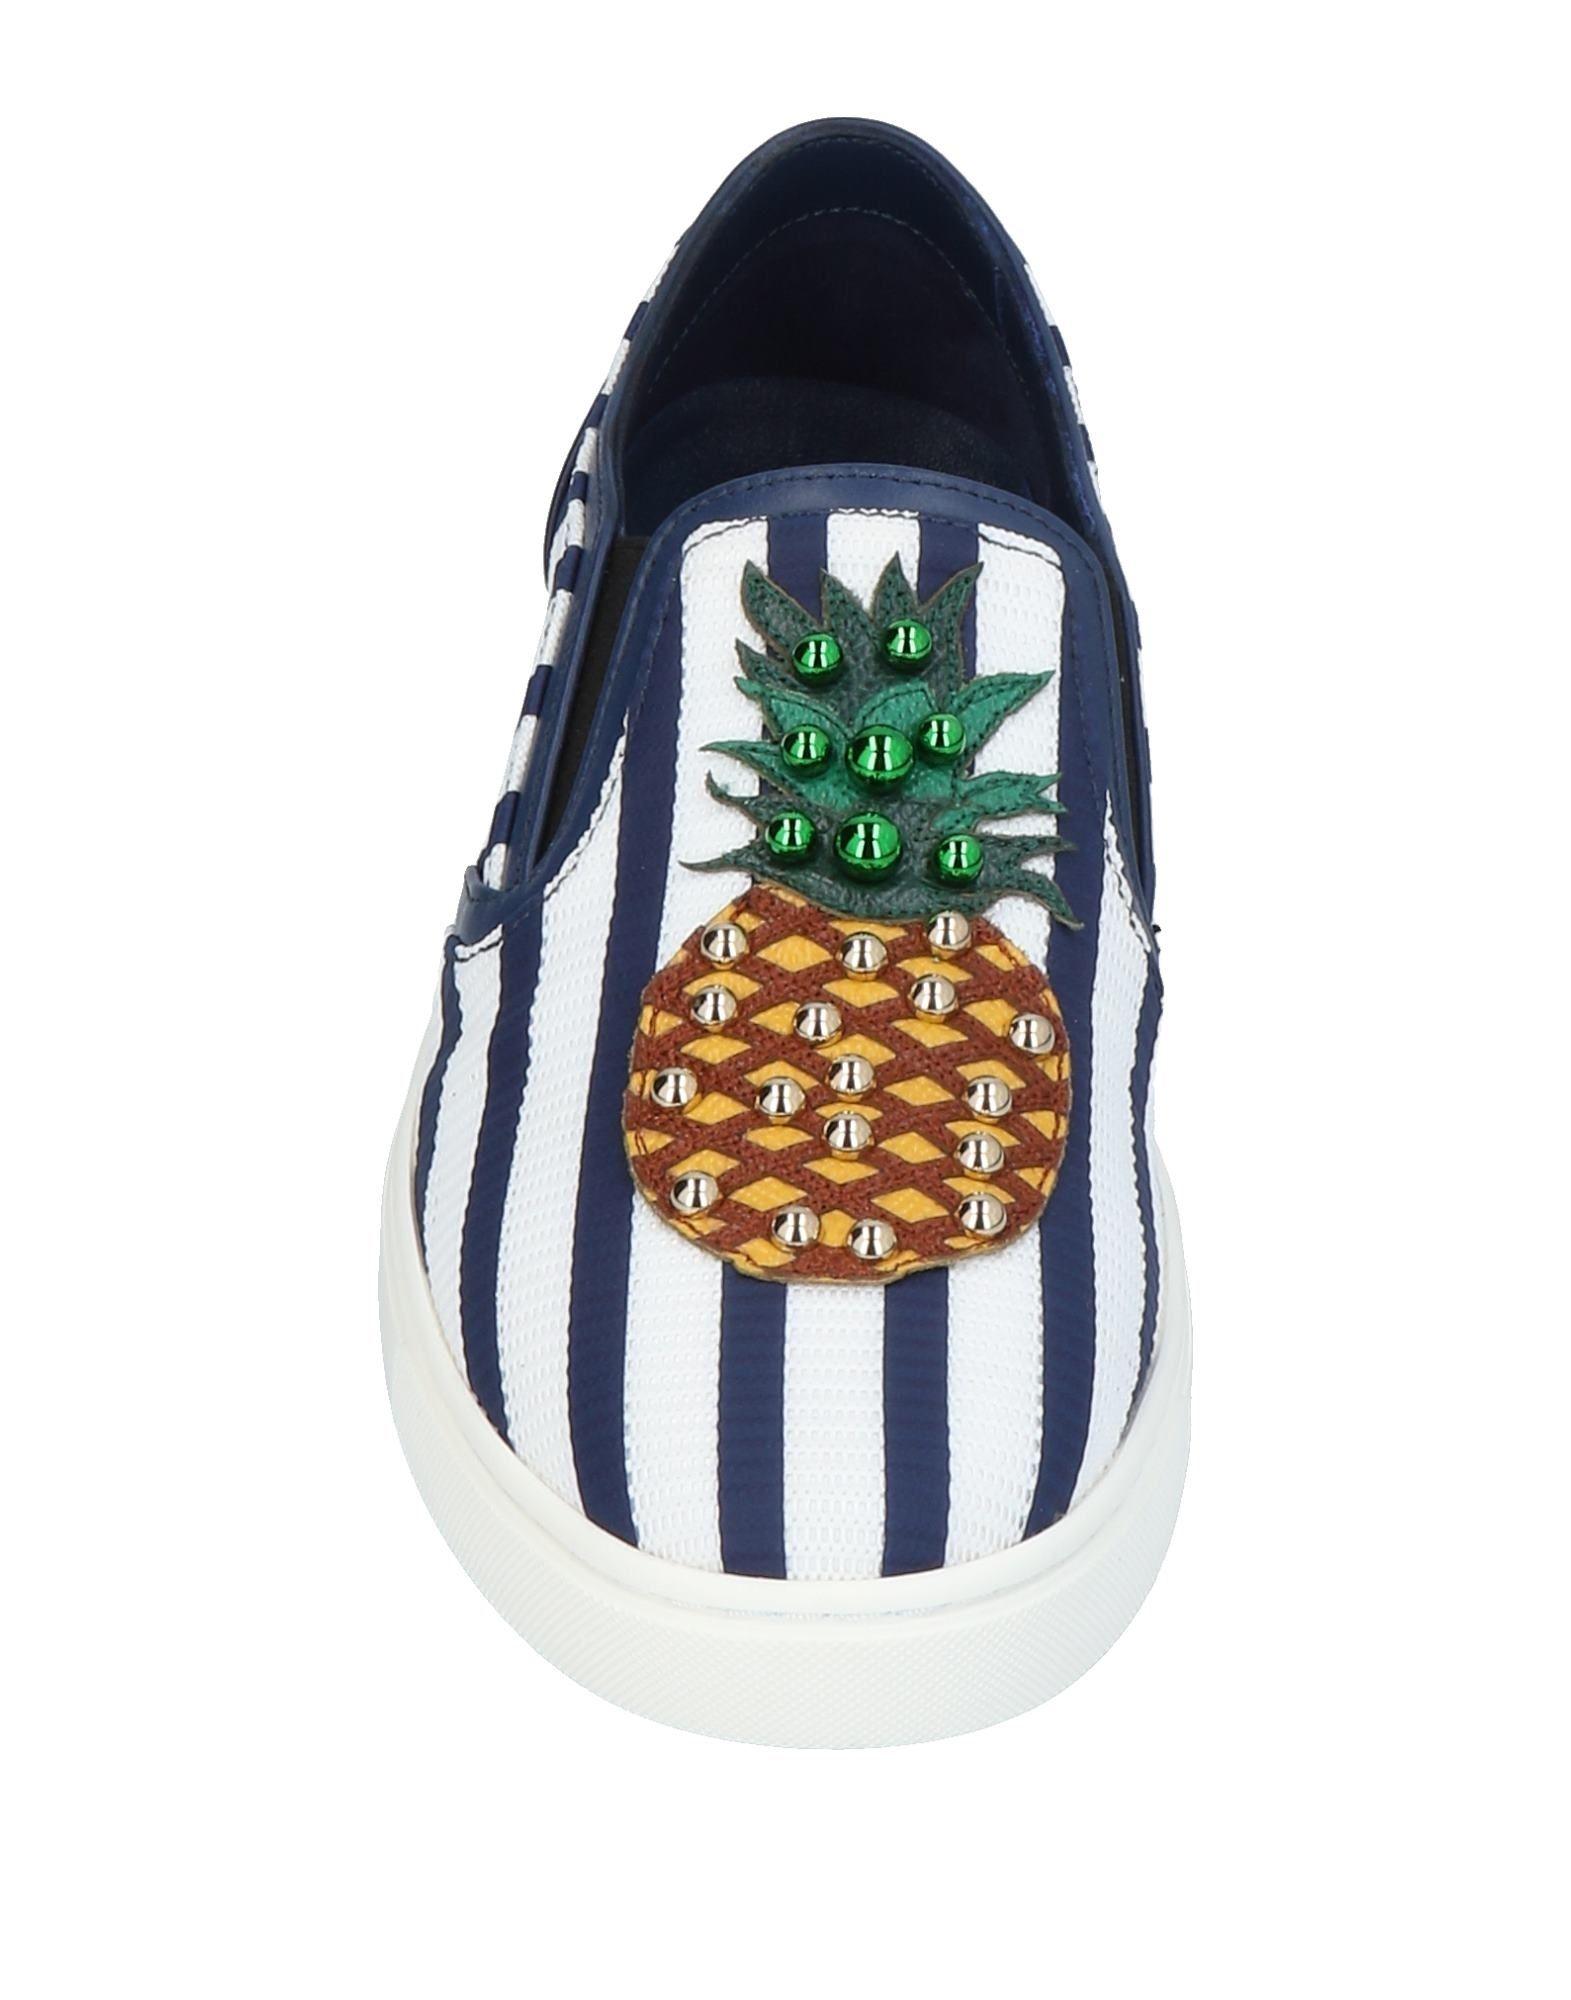 Dolce & Gabbana Sneakers aussehende Damen  11453730UHGünstige gut aussehende Sneakers Schuhe a39106